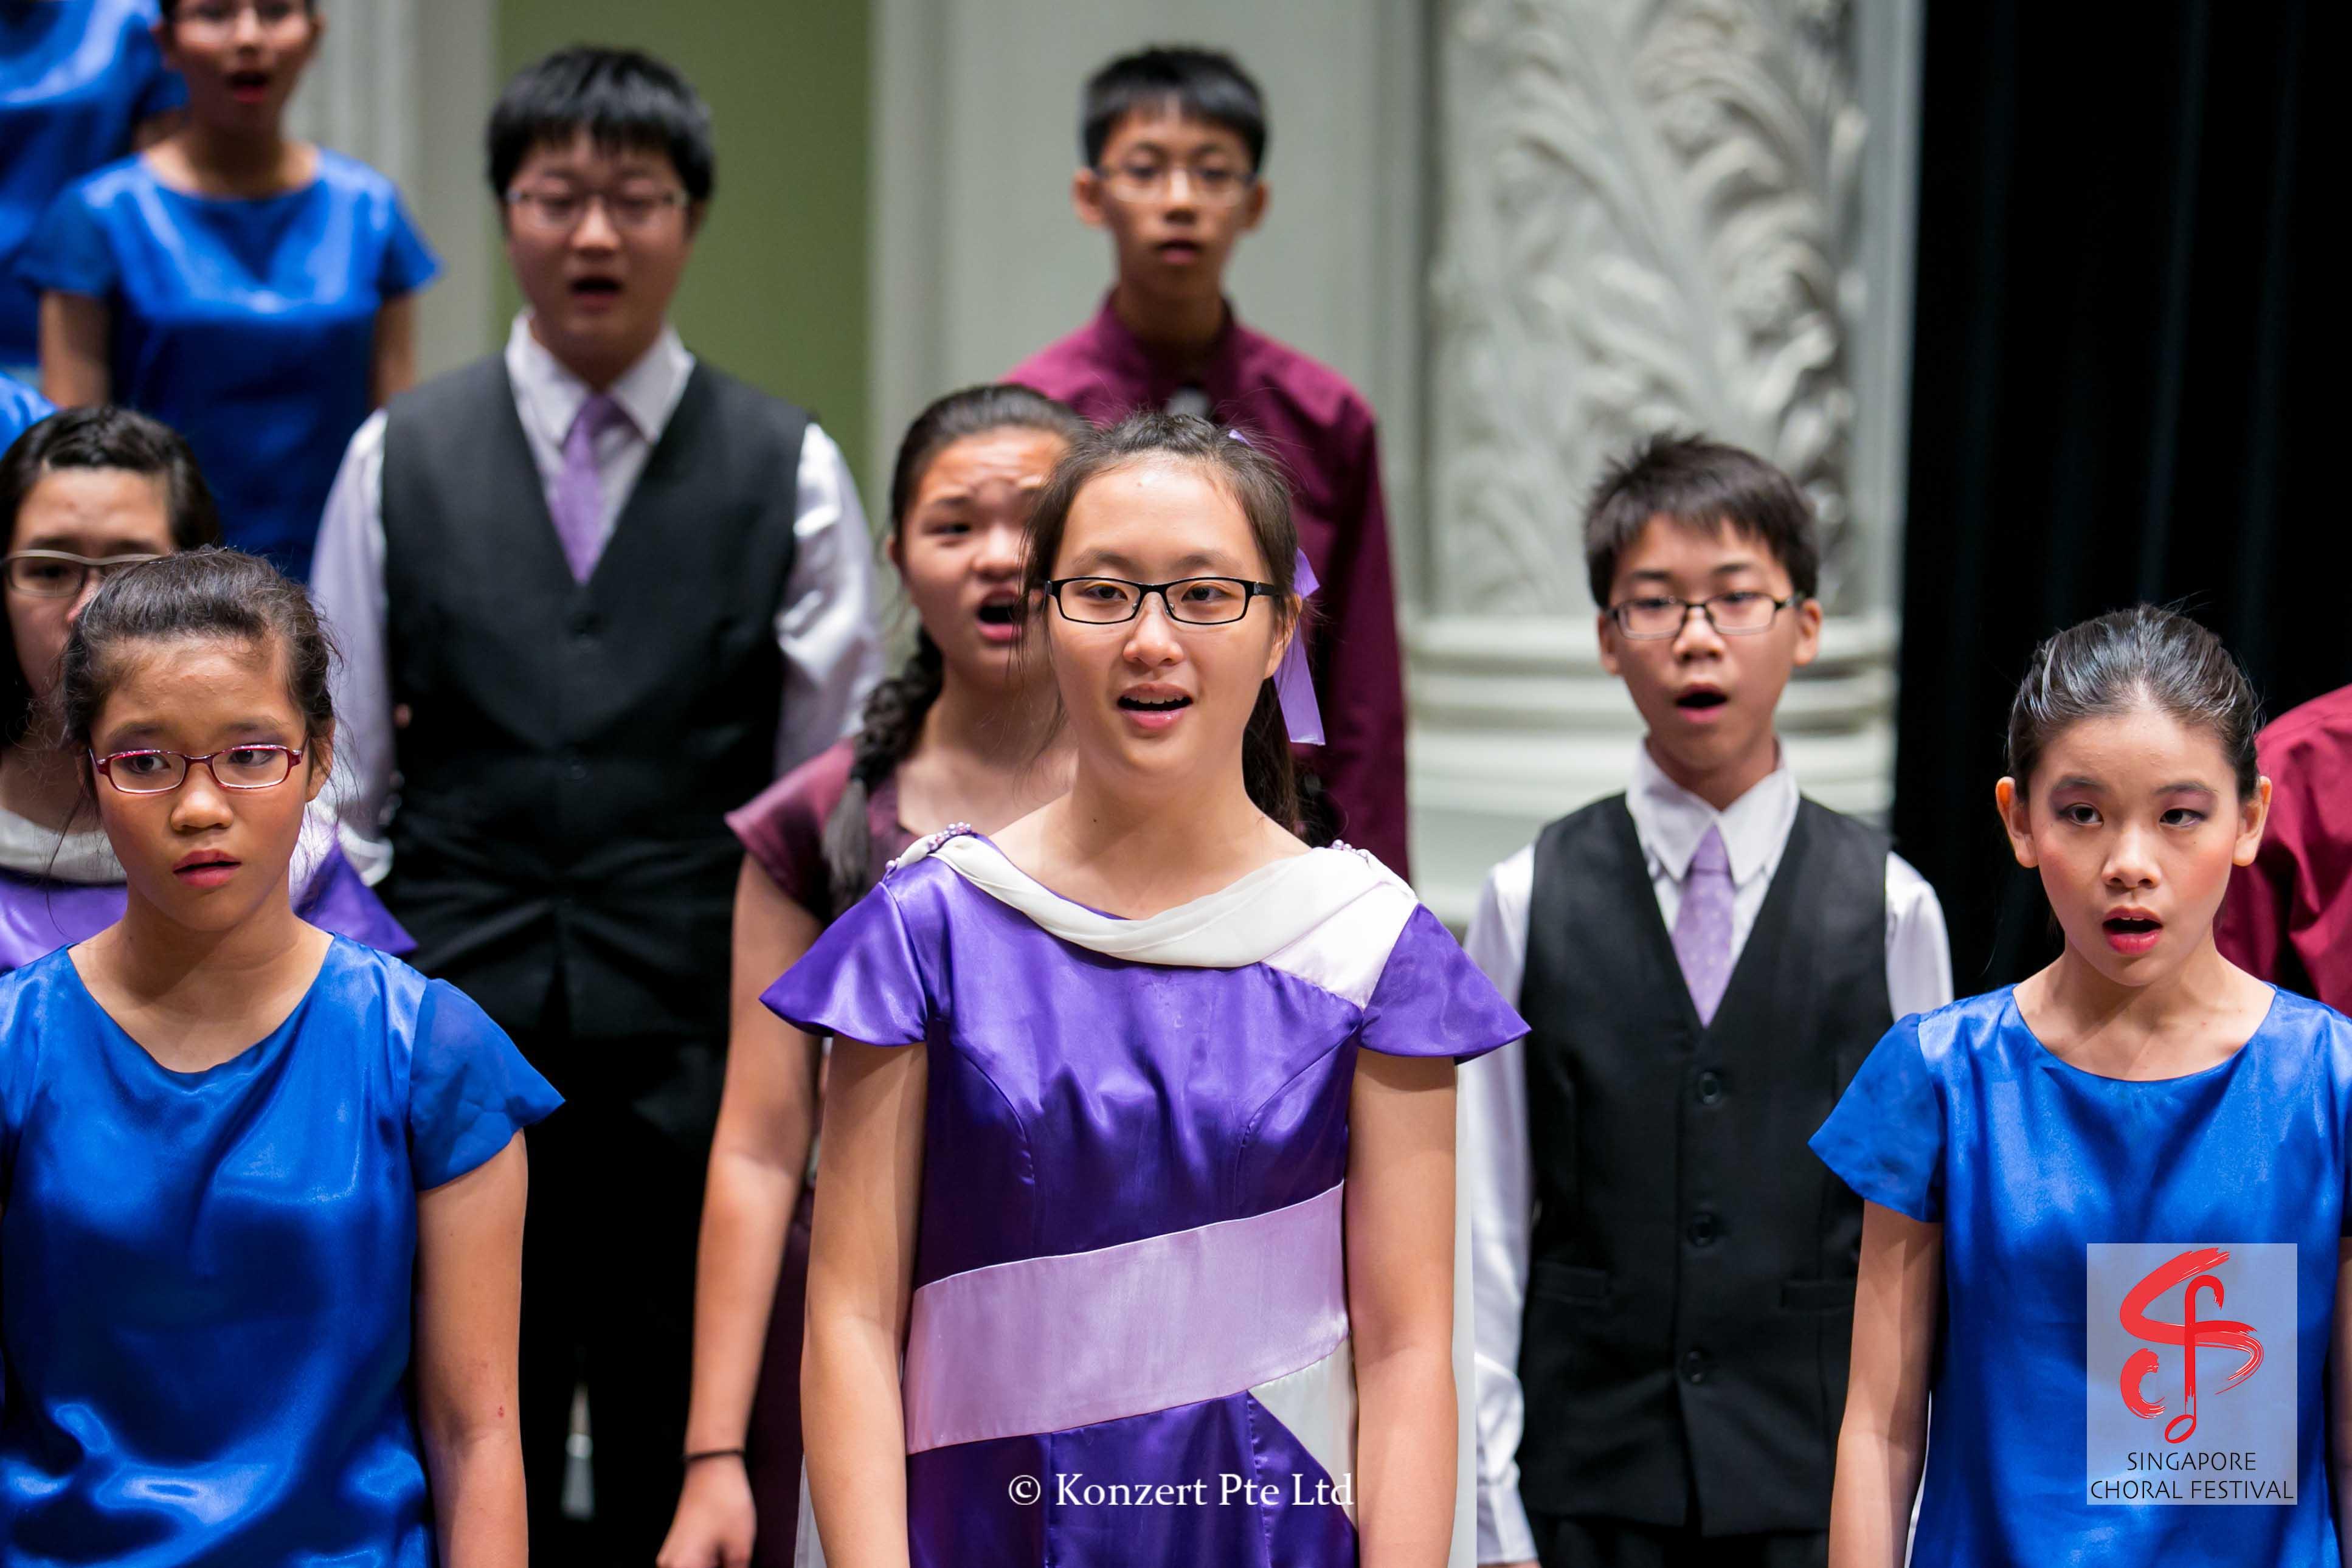 Singapore Choral Festival 7-8-15 (96).jpg